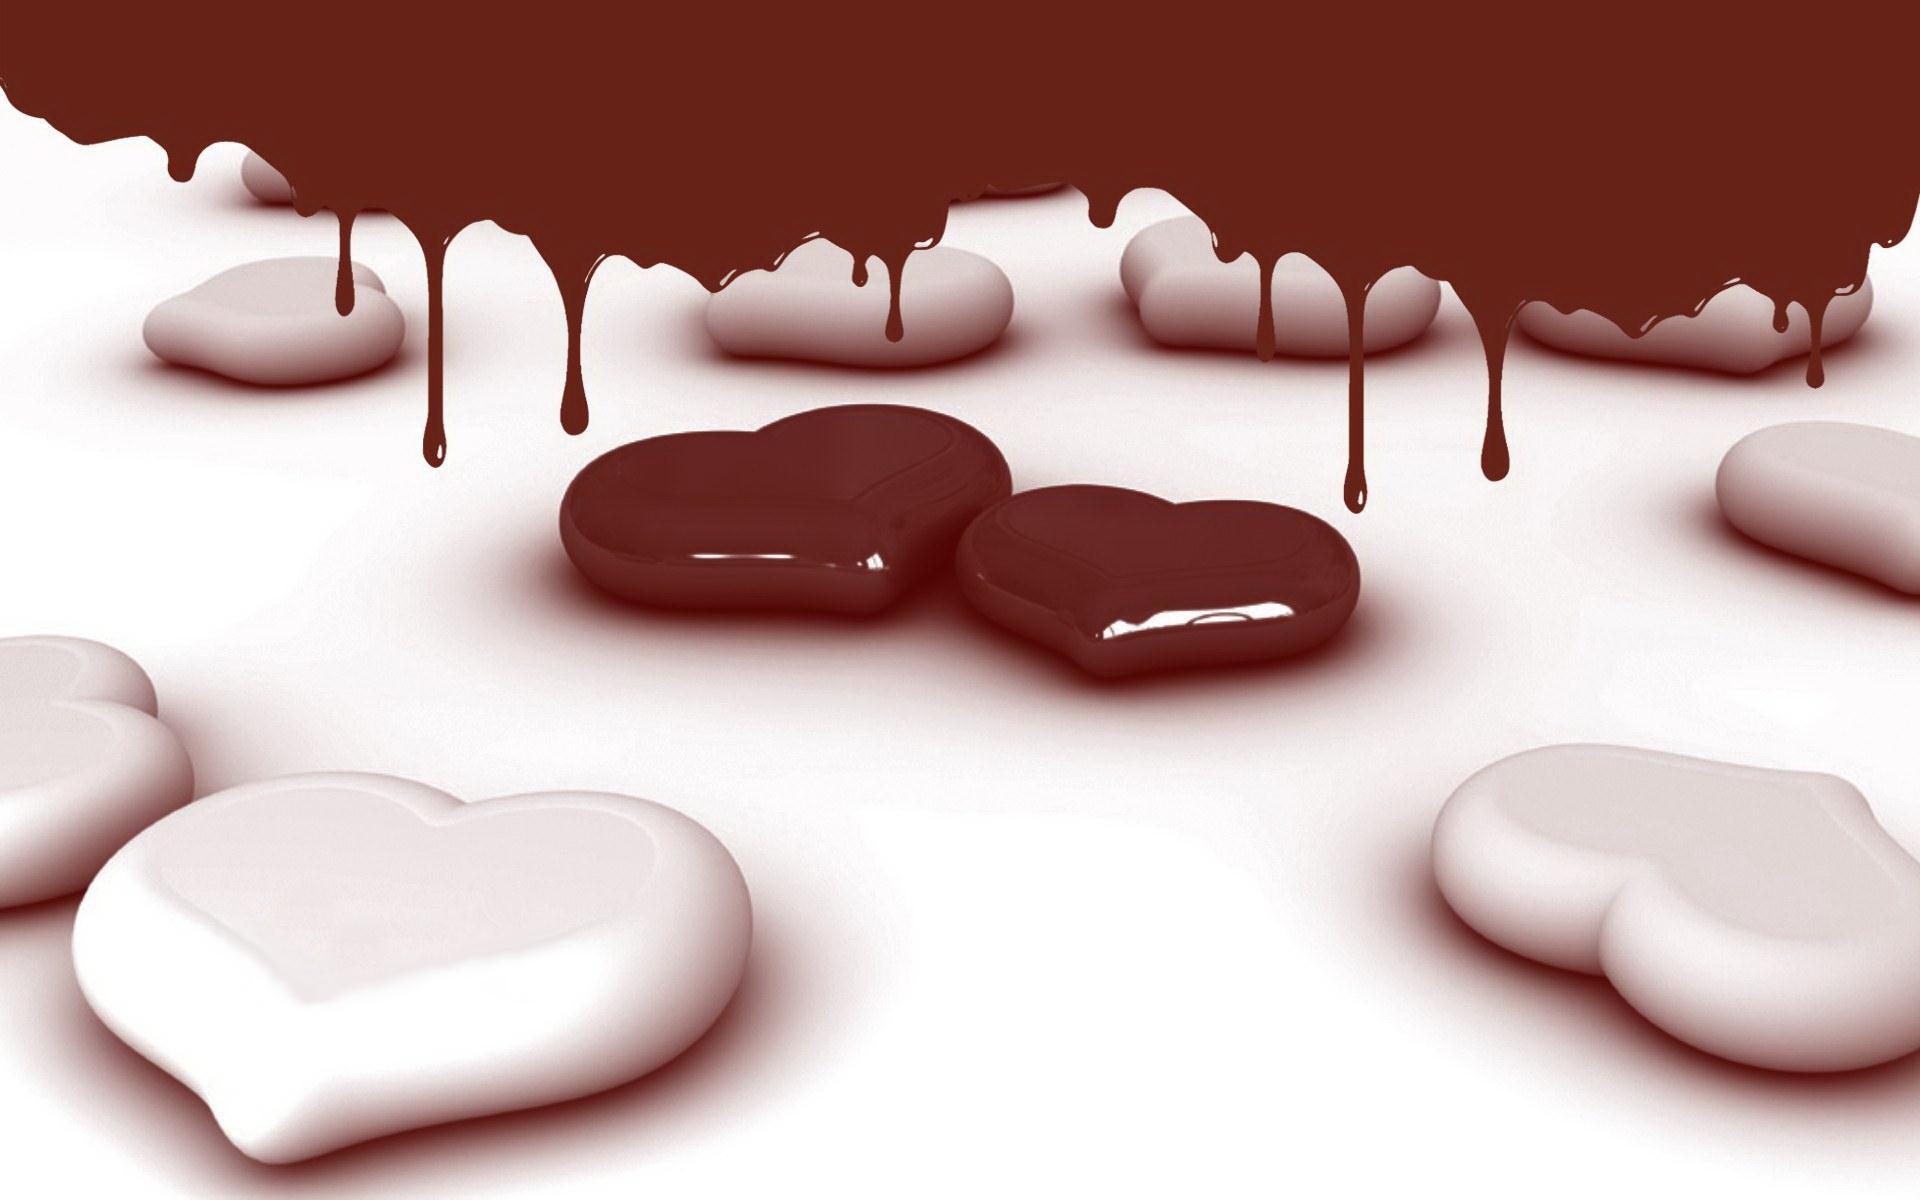 chocolate wallpaper 16407 1920x1200 px ~ hdwallsource